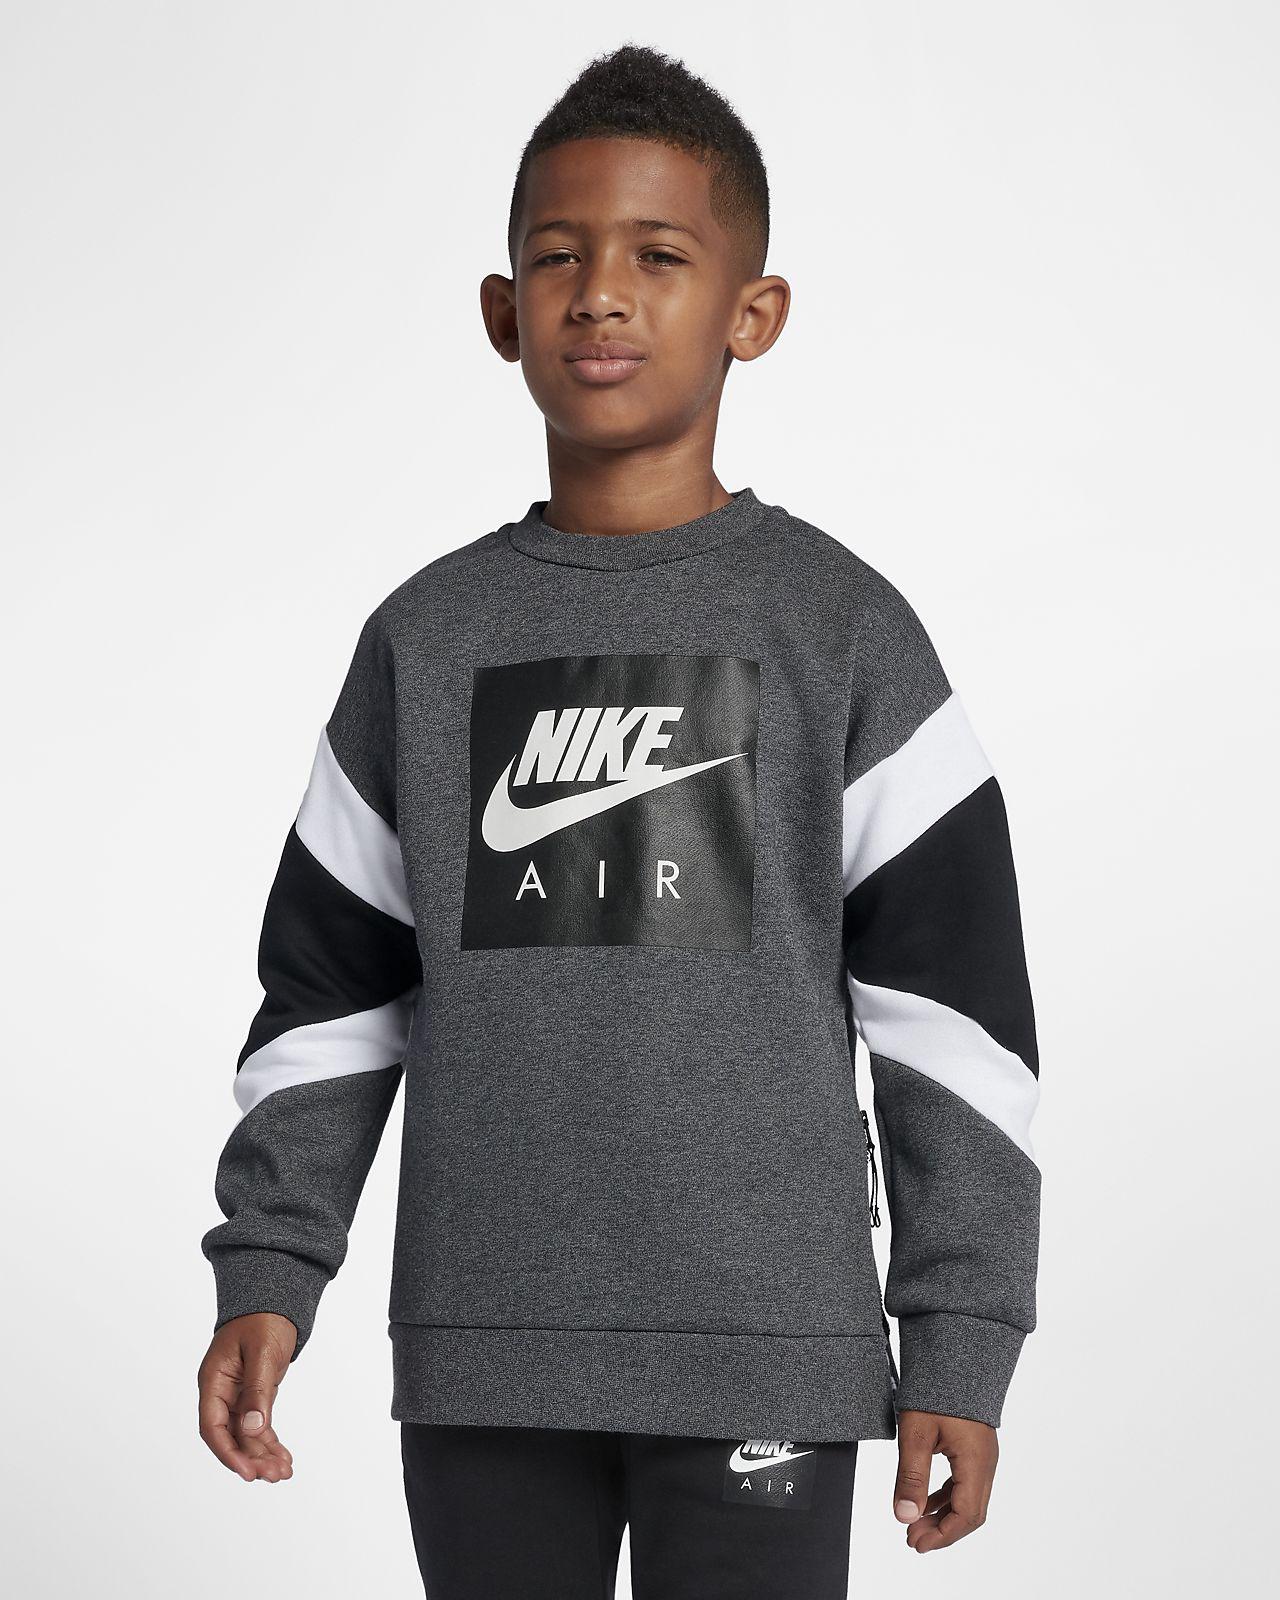 boys' Fi Older Air Crew Kids' Nike UwMpROqR